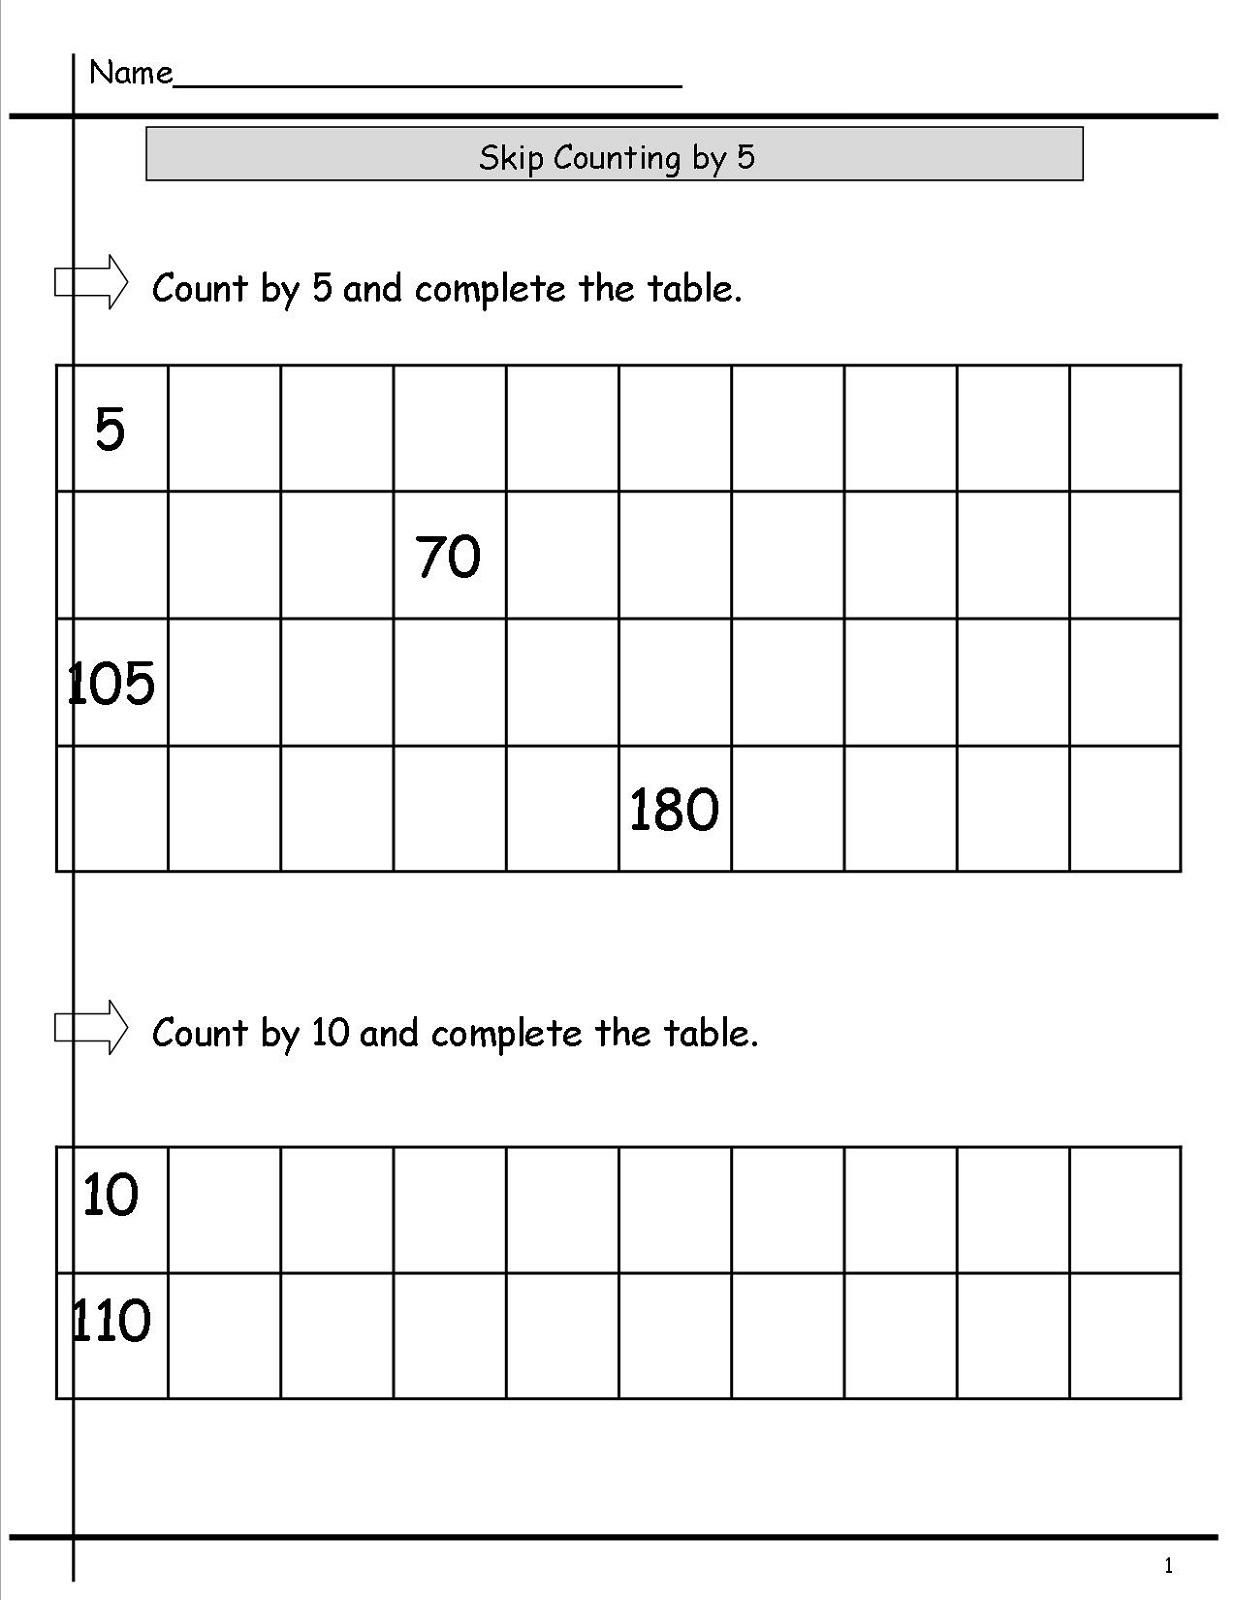 5 Skip Counting Worksheet